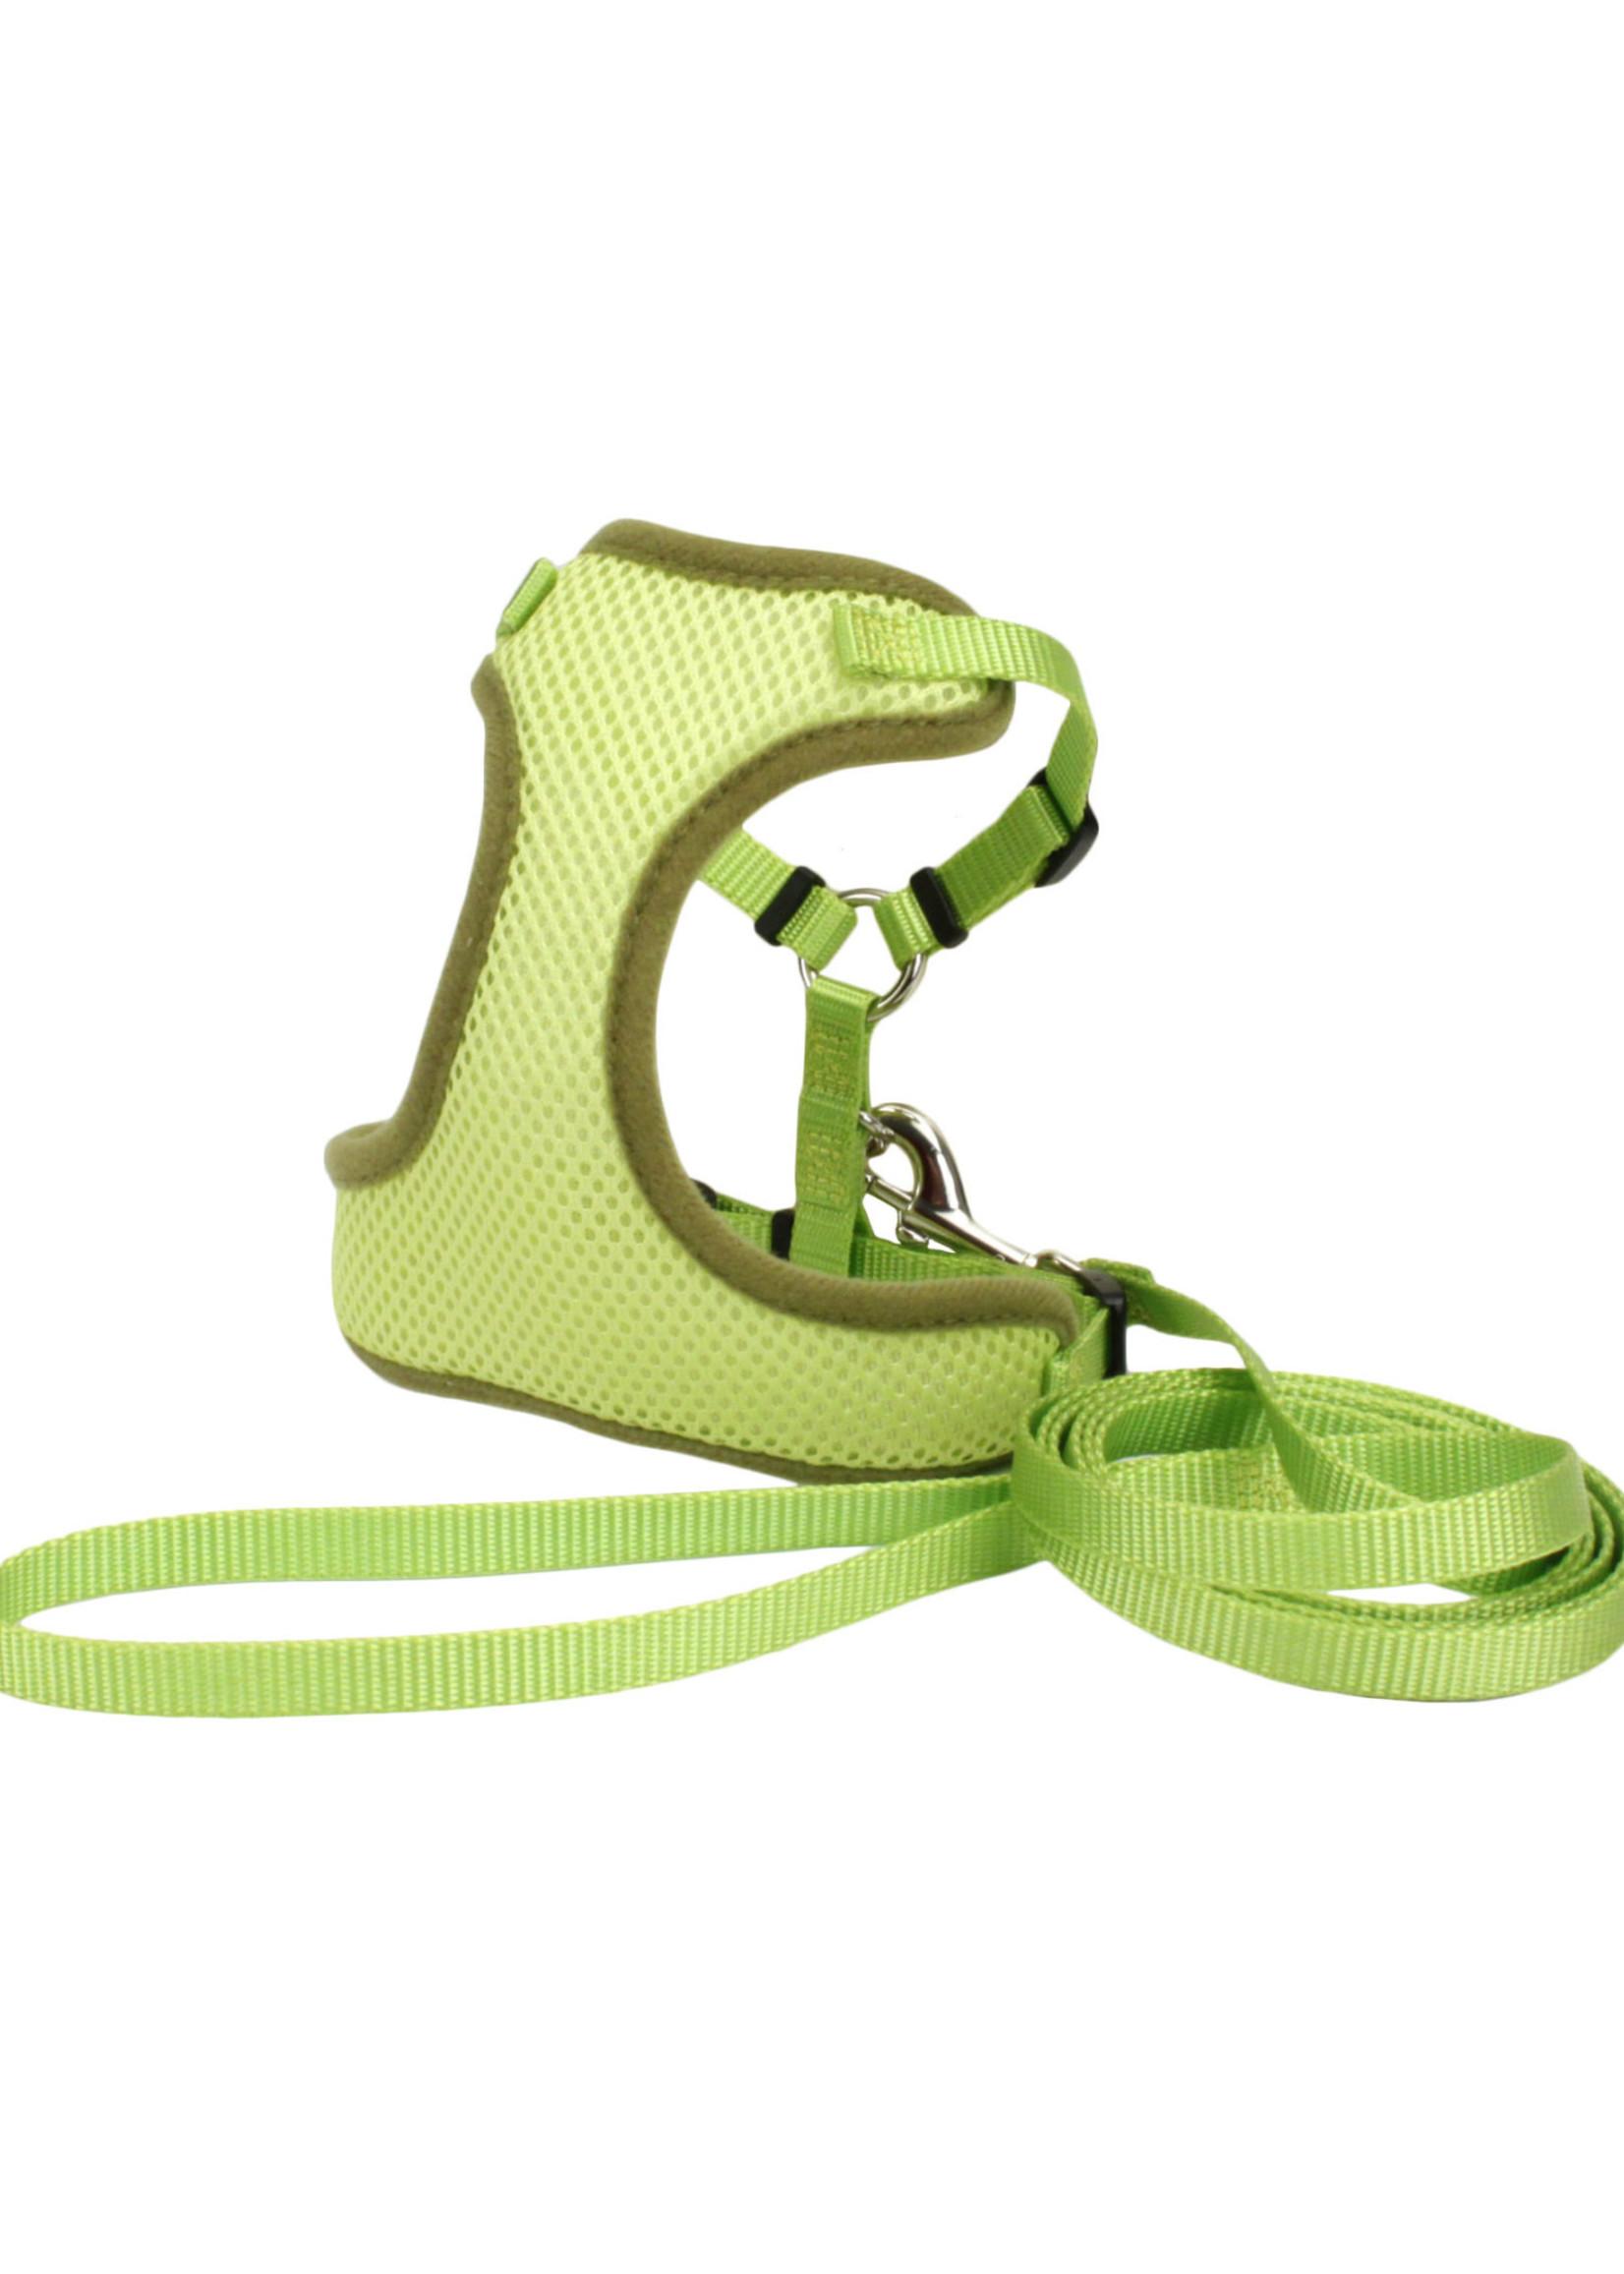 Comfort Soft® Comfort Soft® Adjustable Harness with 6' Leash